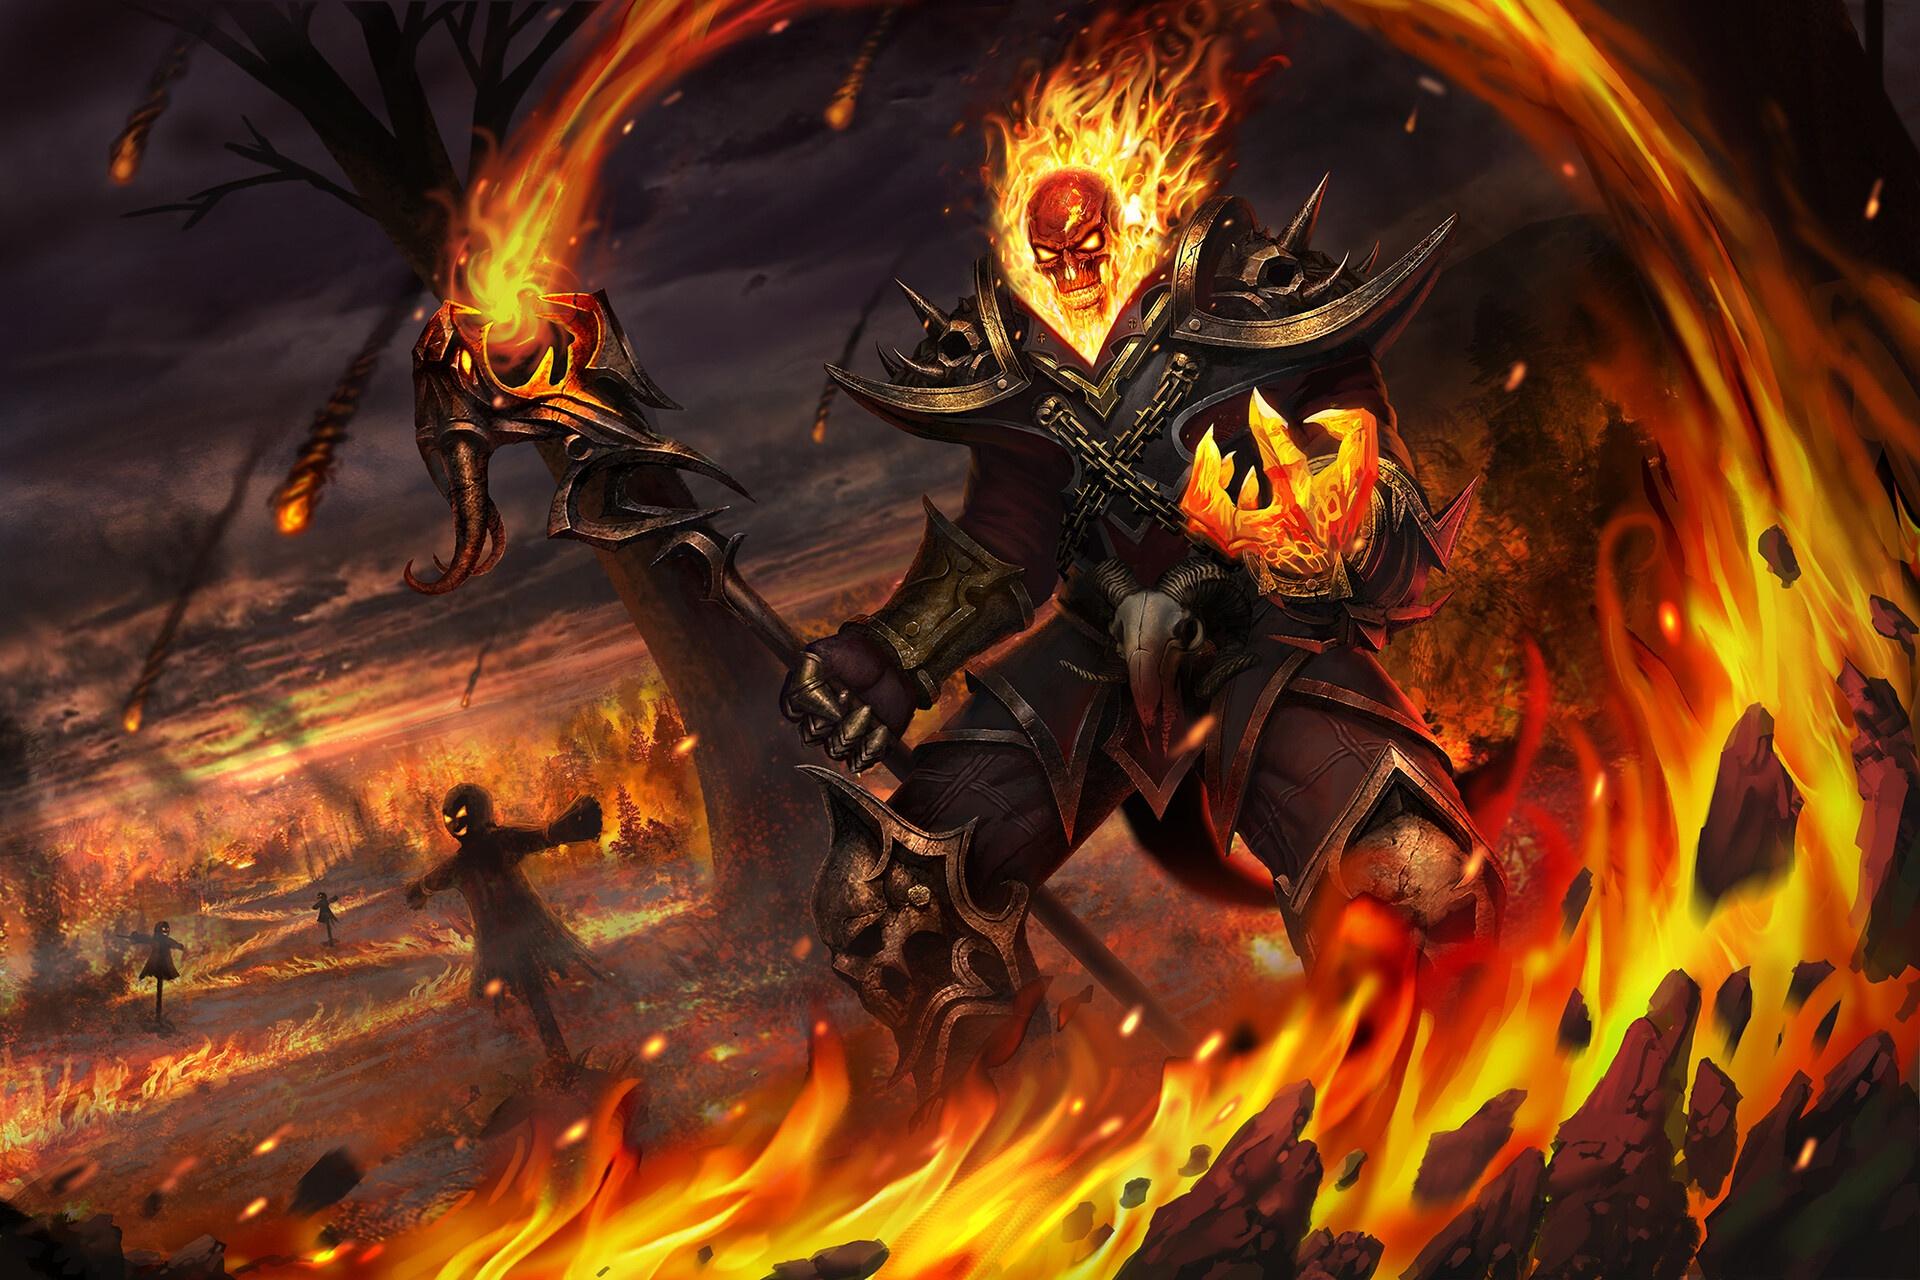 fantasy art artwork fire